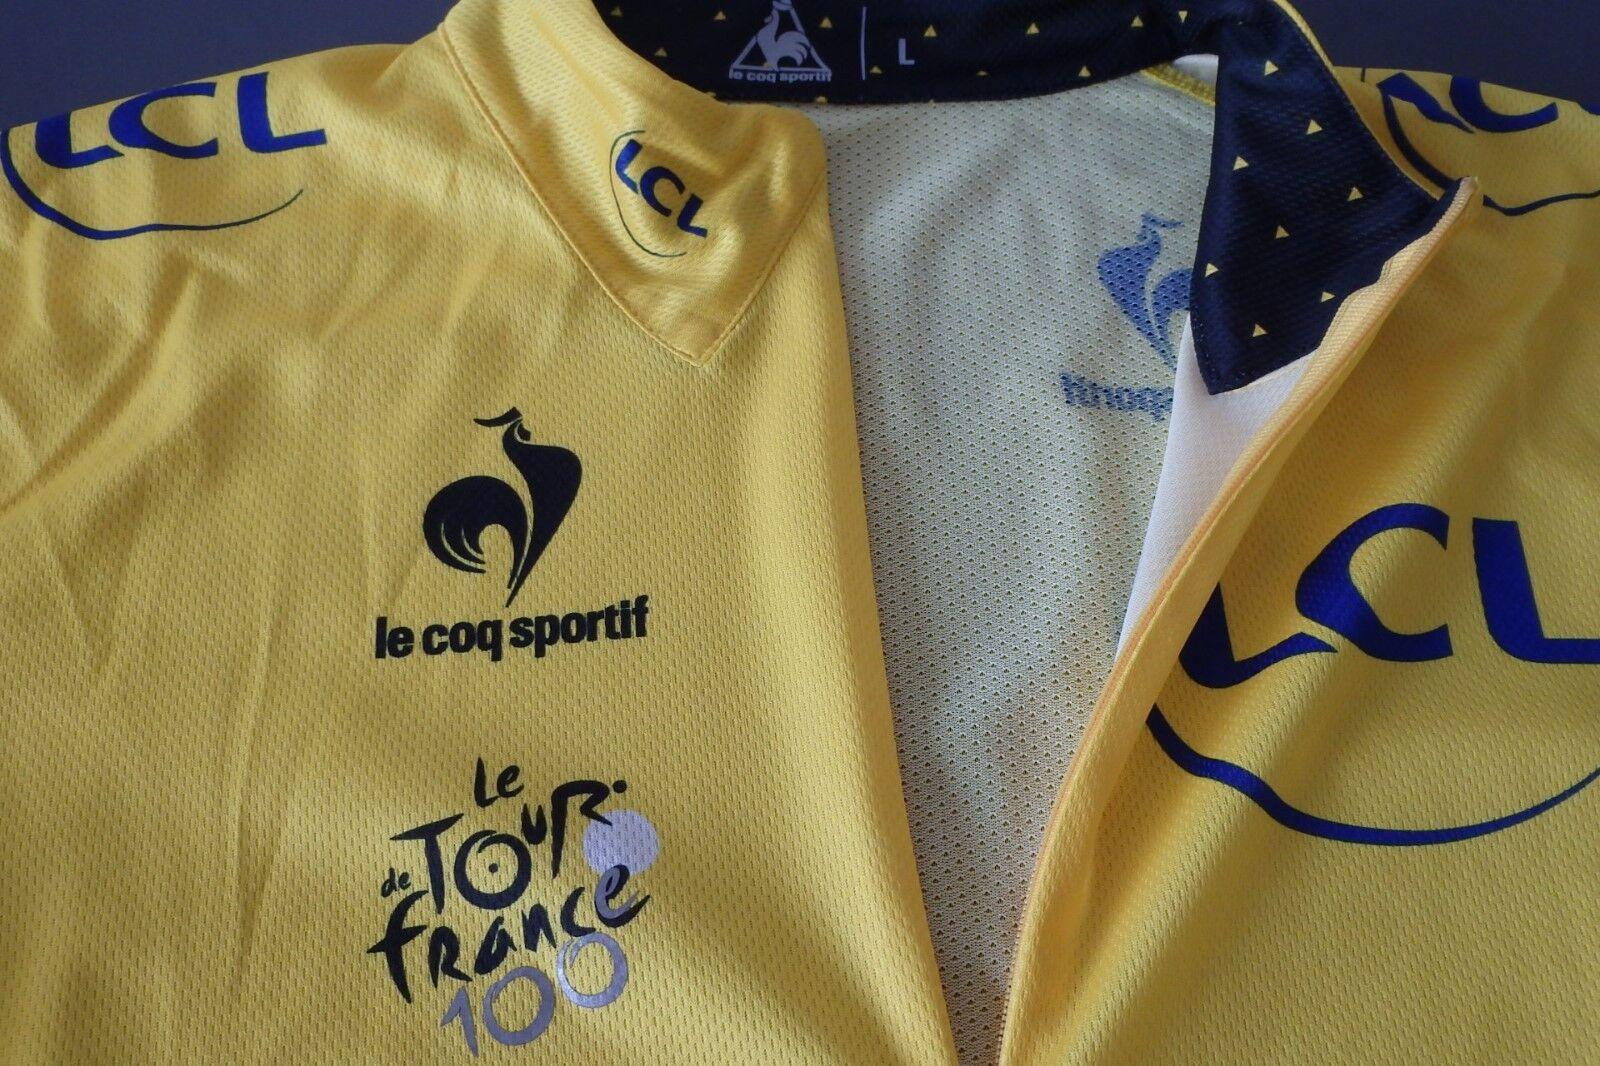 Le Coq Sportif 100th Tour de France comemorative yellow jersey   high quaity